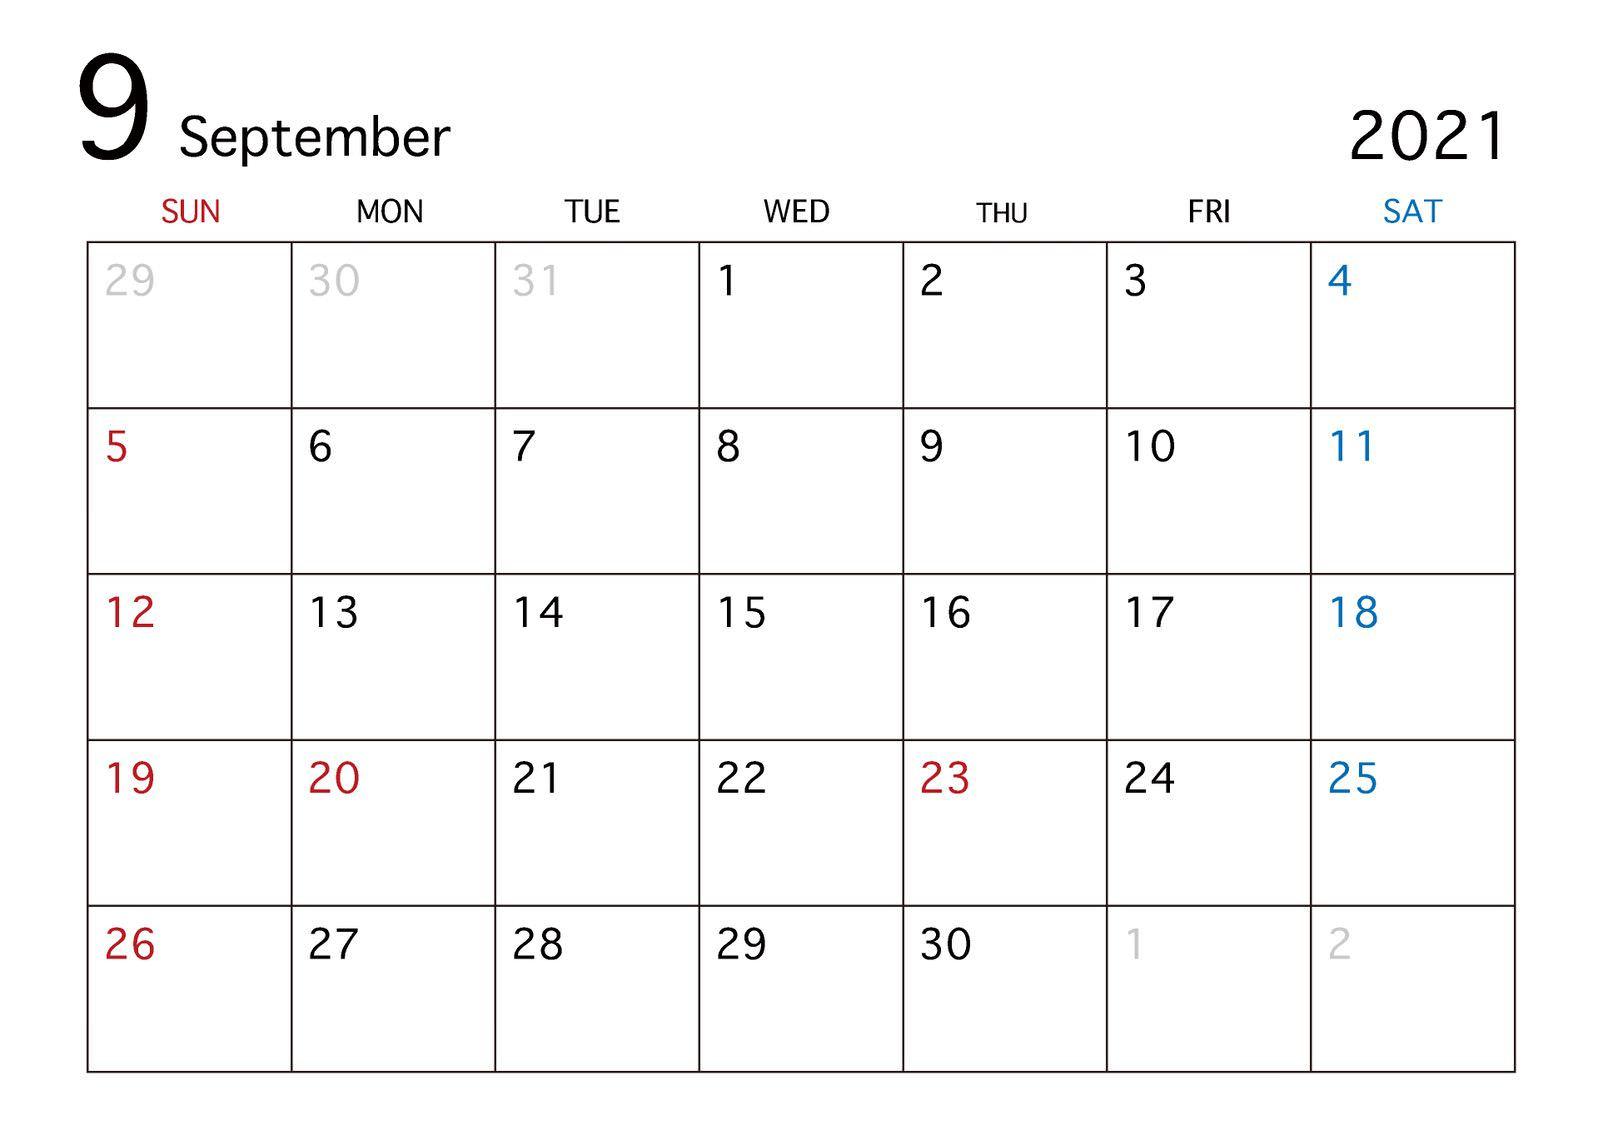 2021 Sep calendar